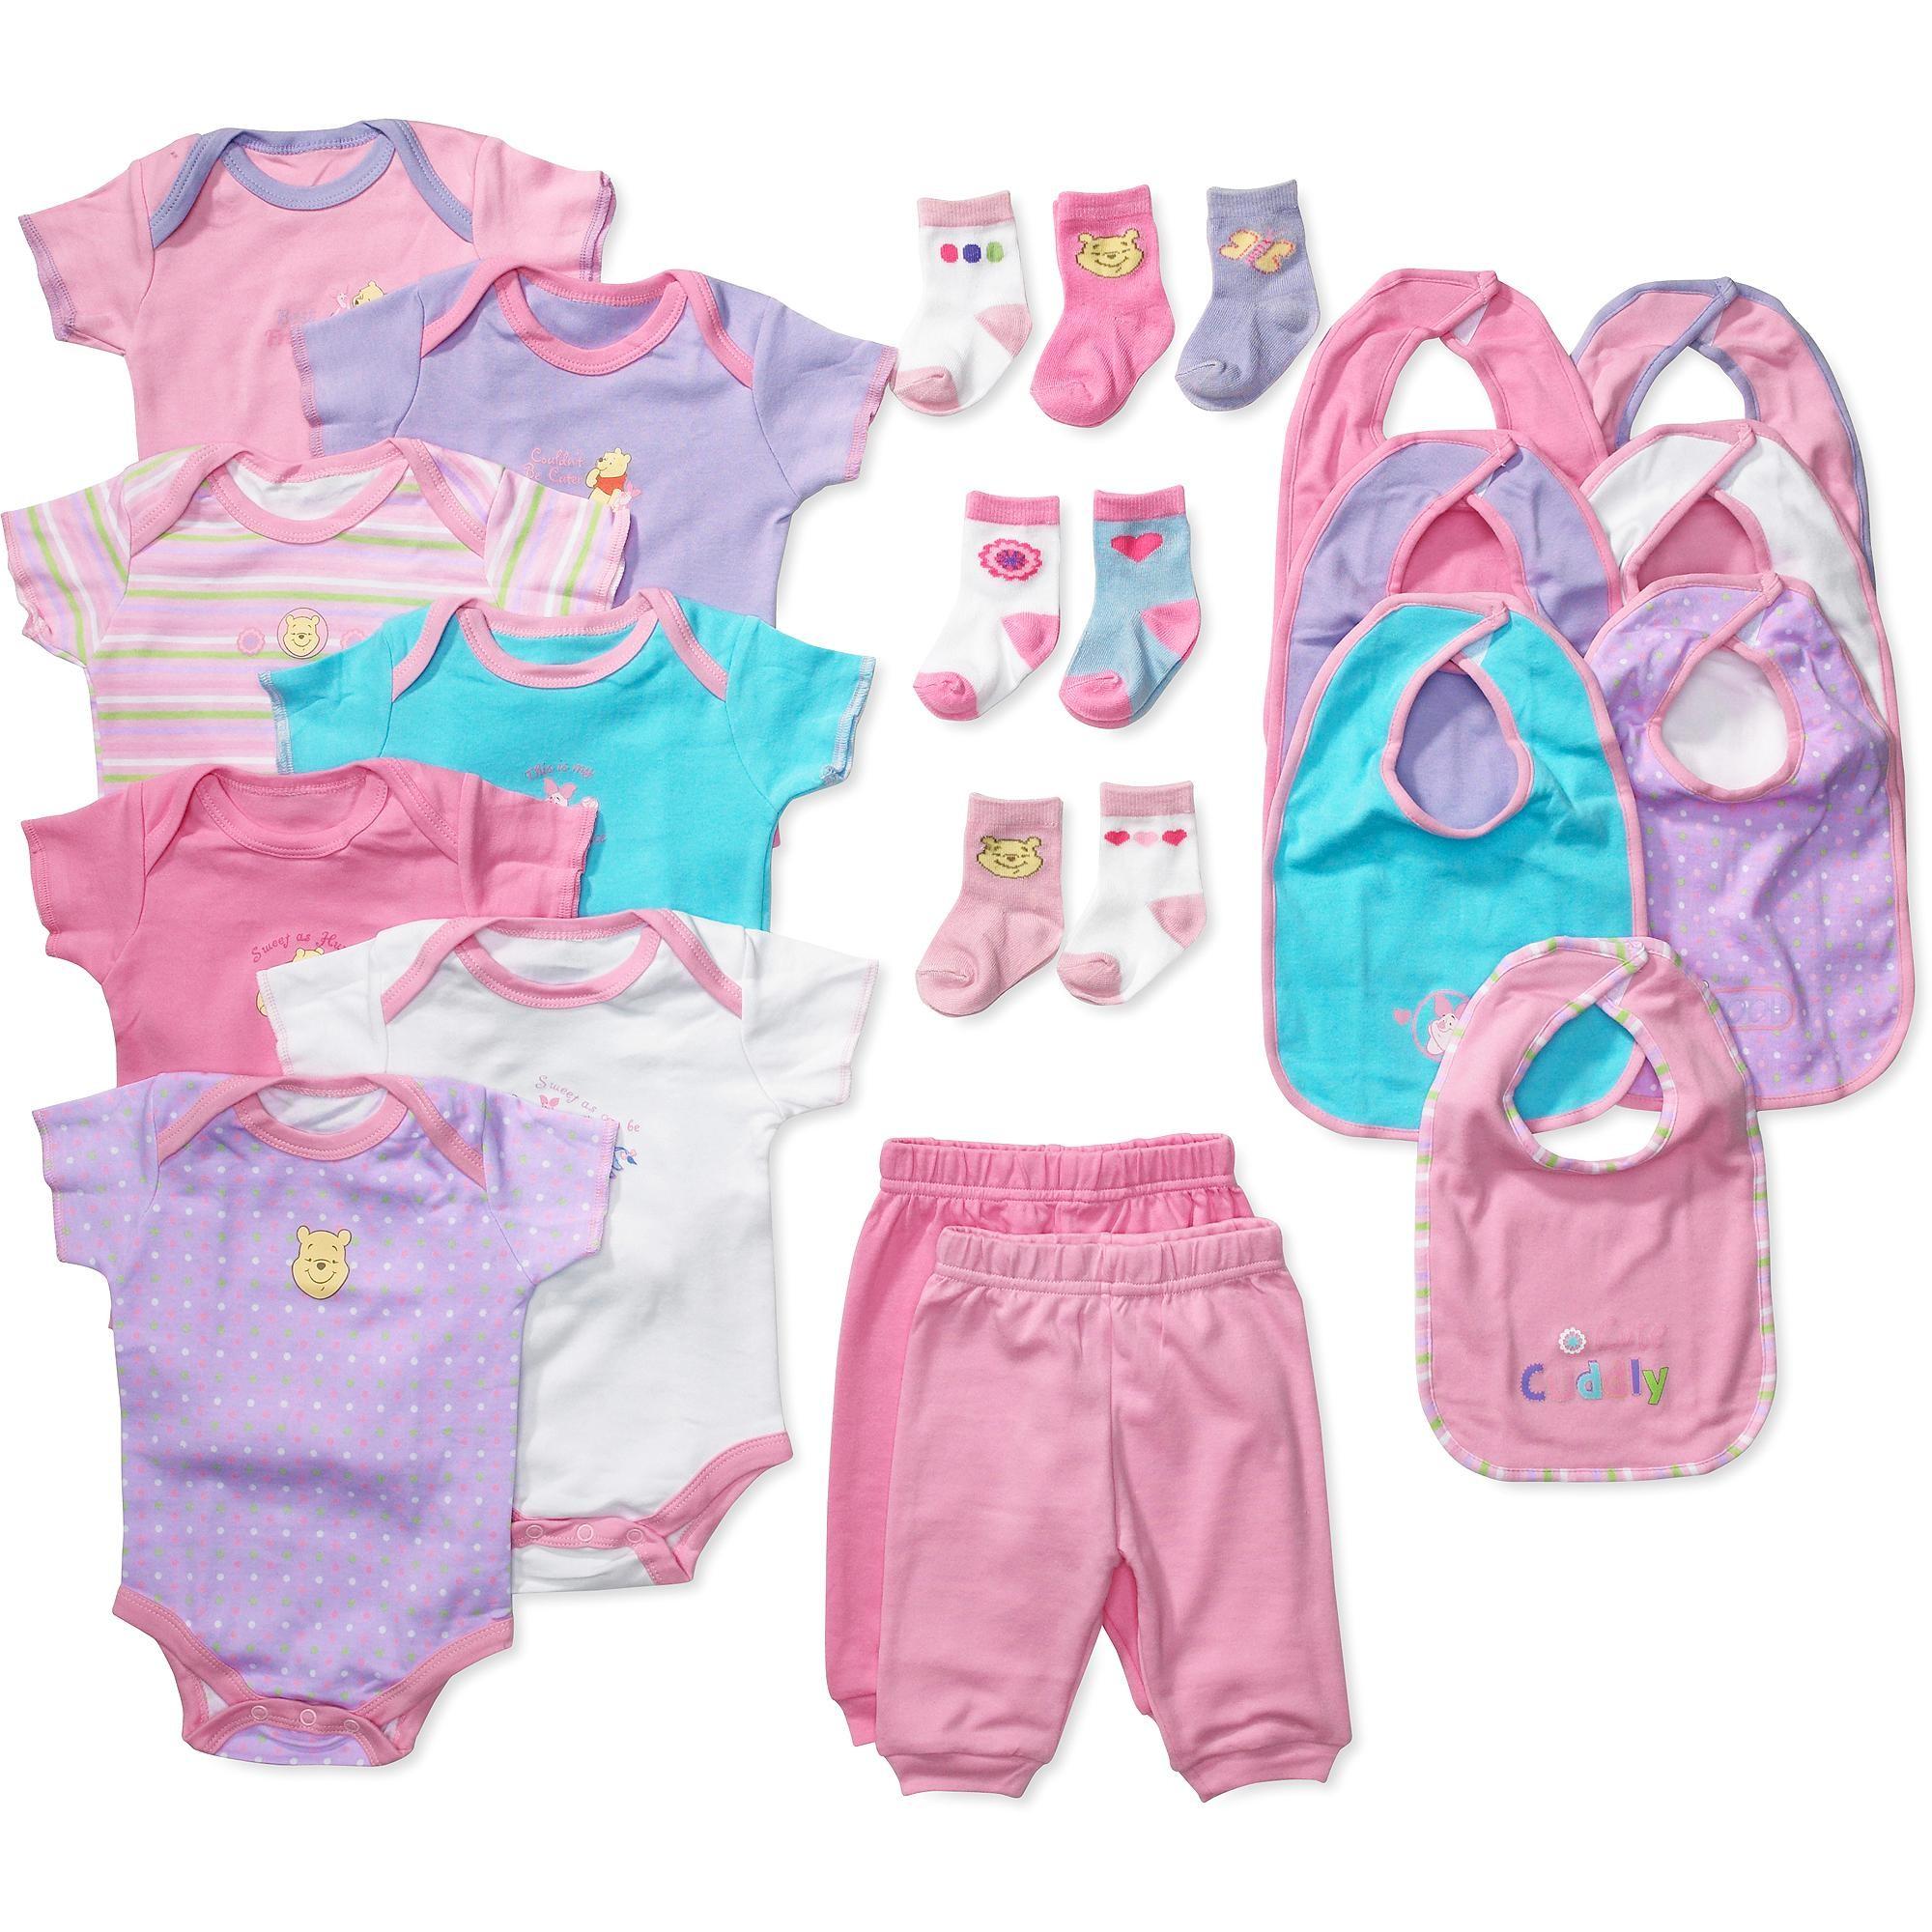 congdongShopify.com - Những điều cần quan tâm lúc mua sắm quần áo cho em bé sơ sinh